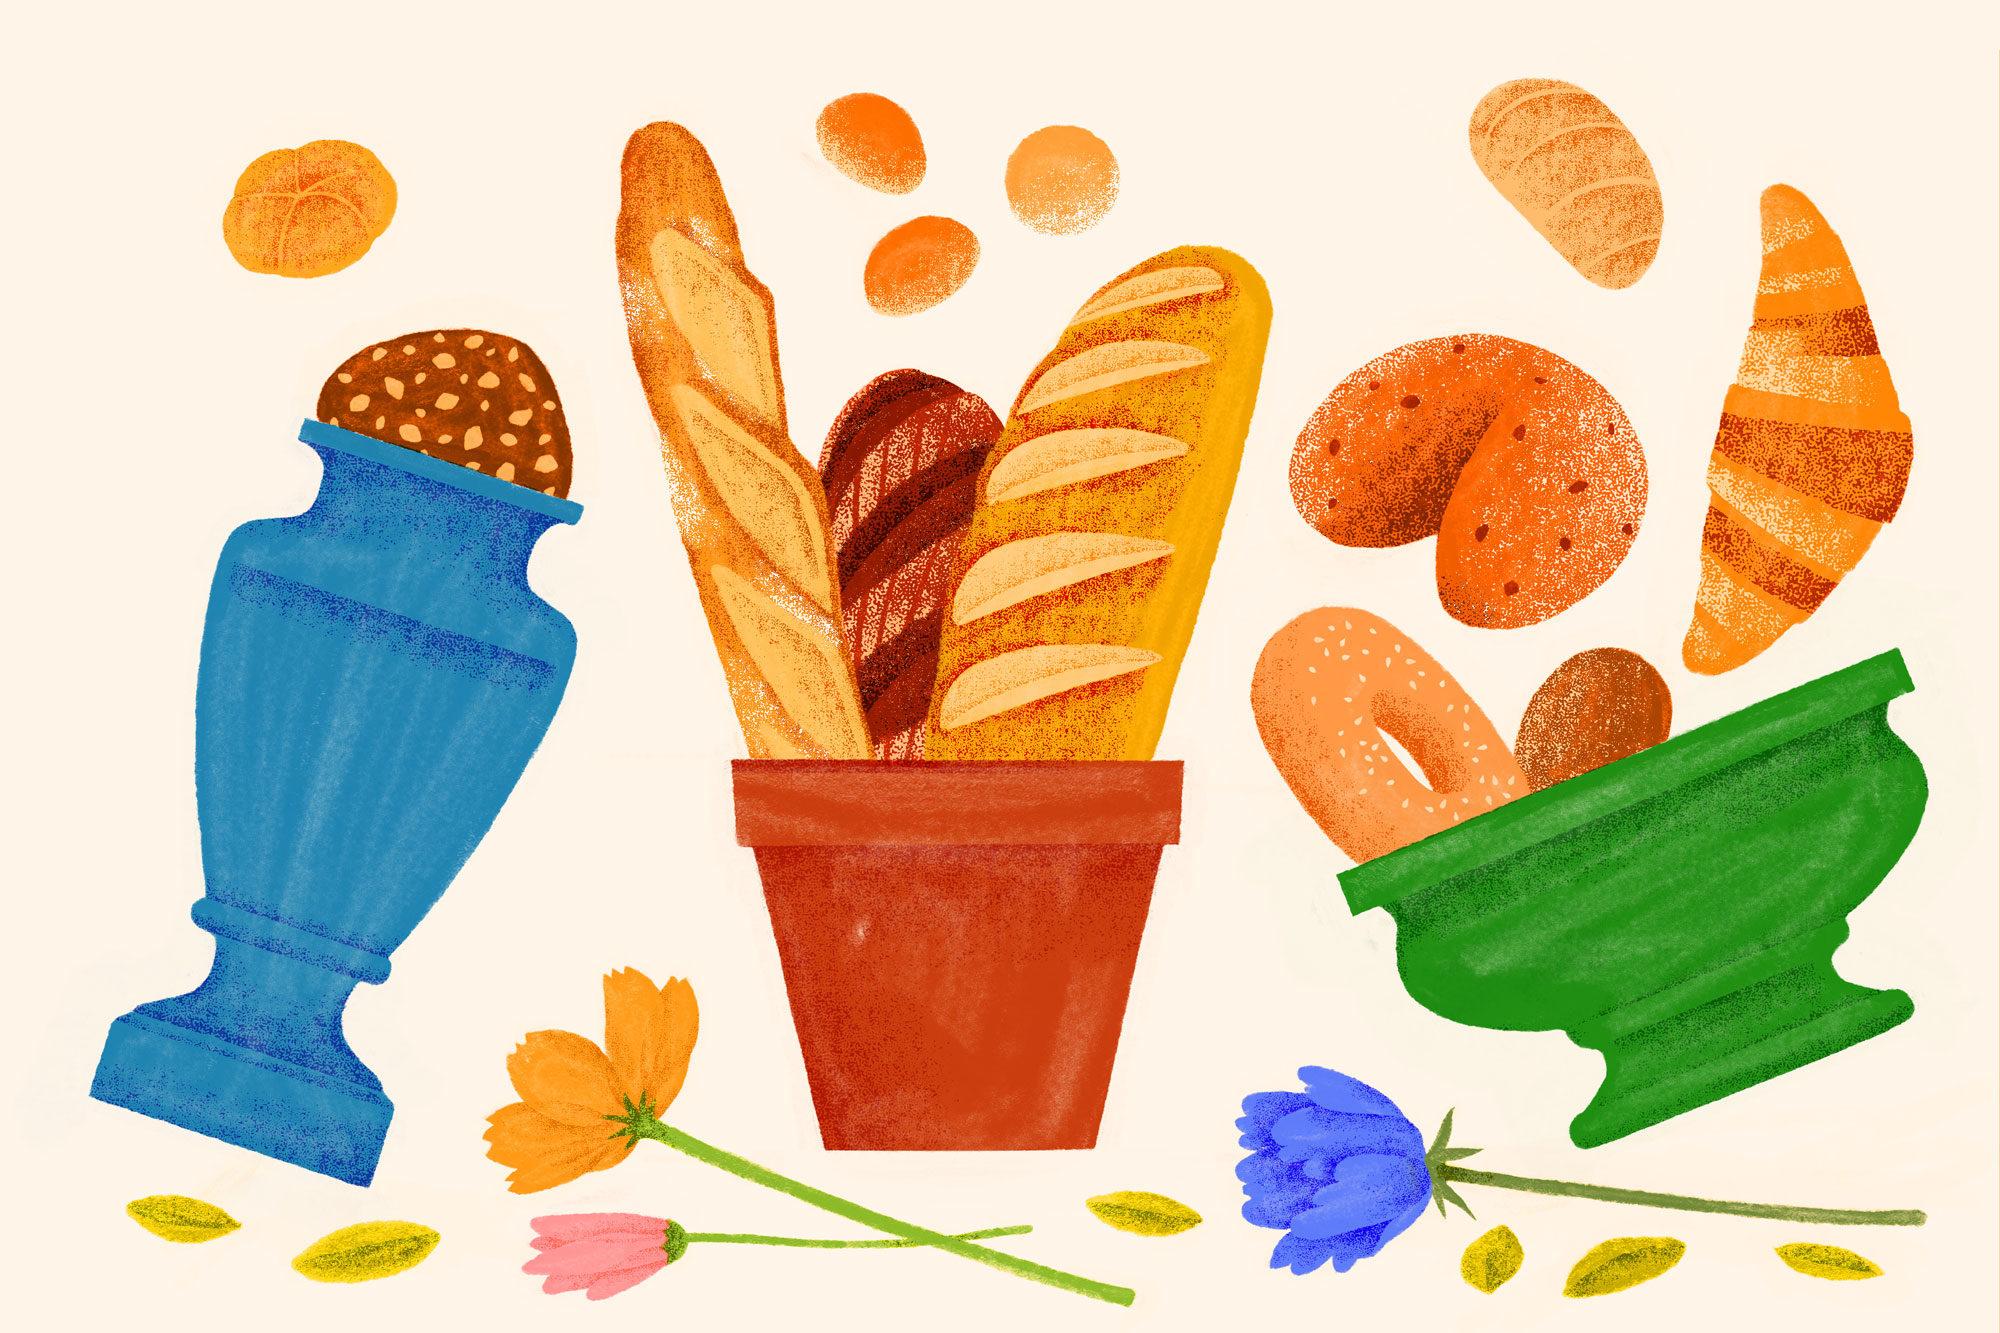 Article-Flower-Pot-Bread